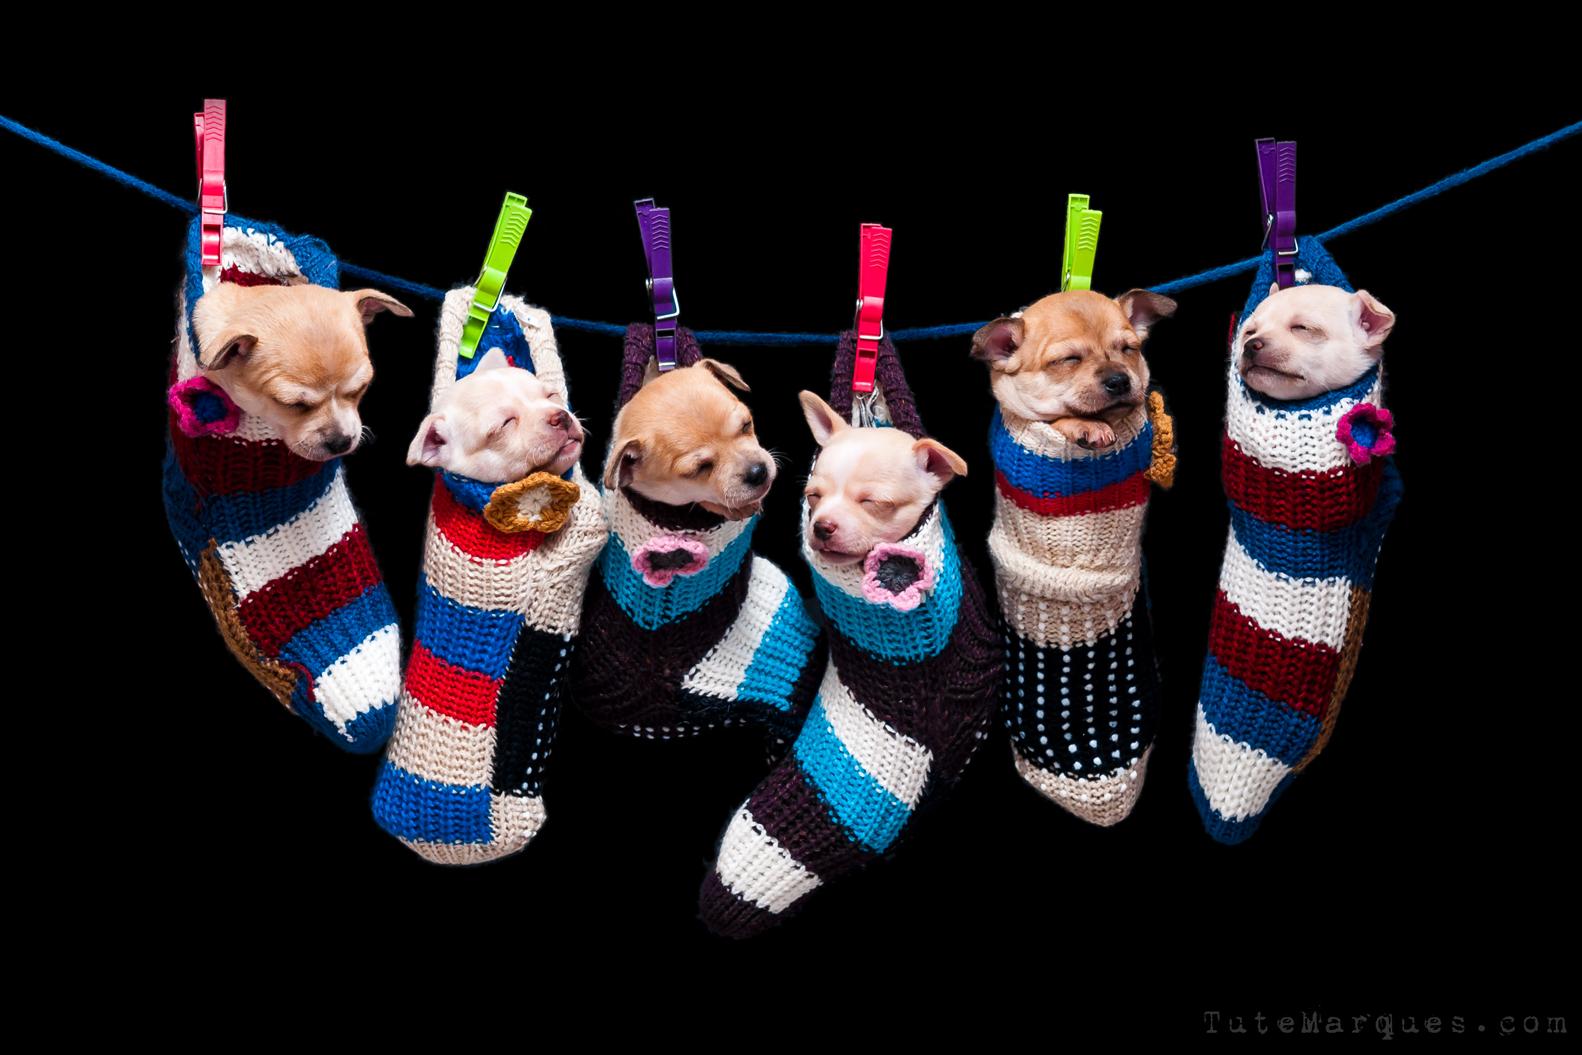 Tute Marques Fotografia- Cachorros y Calcetines - -web04.jpg